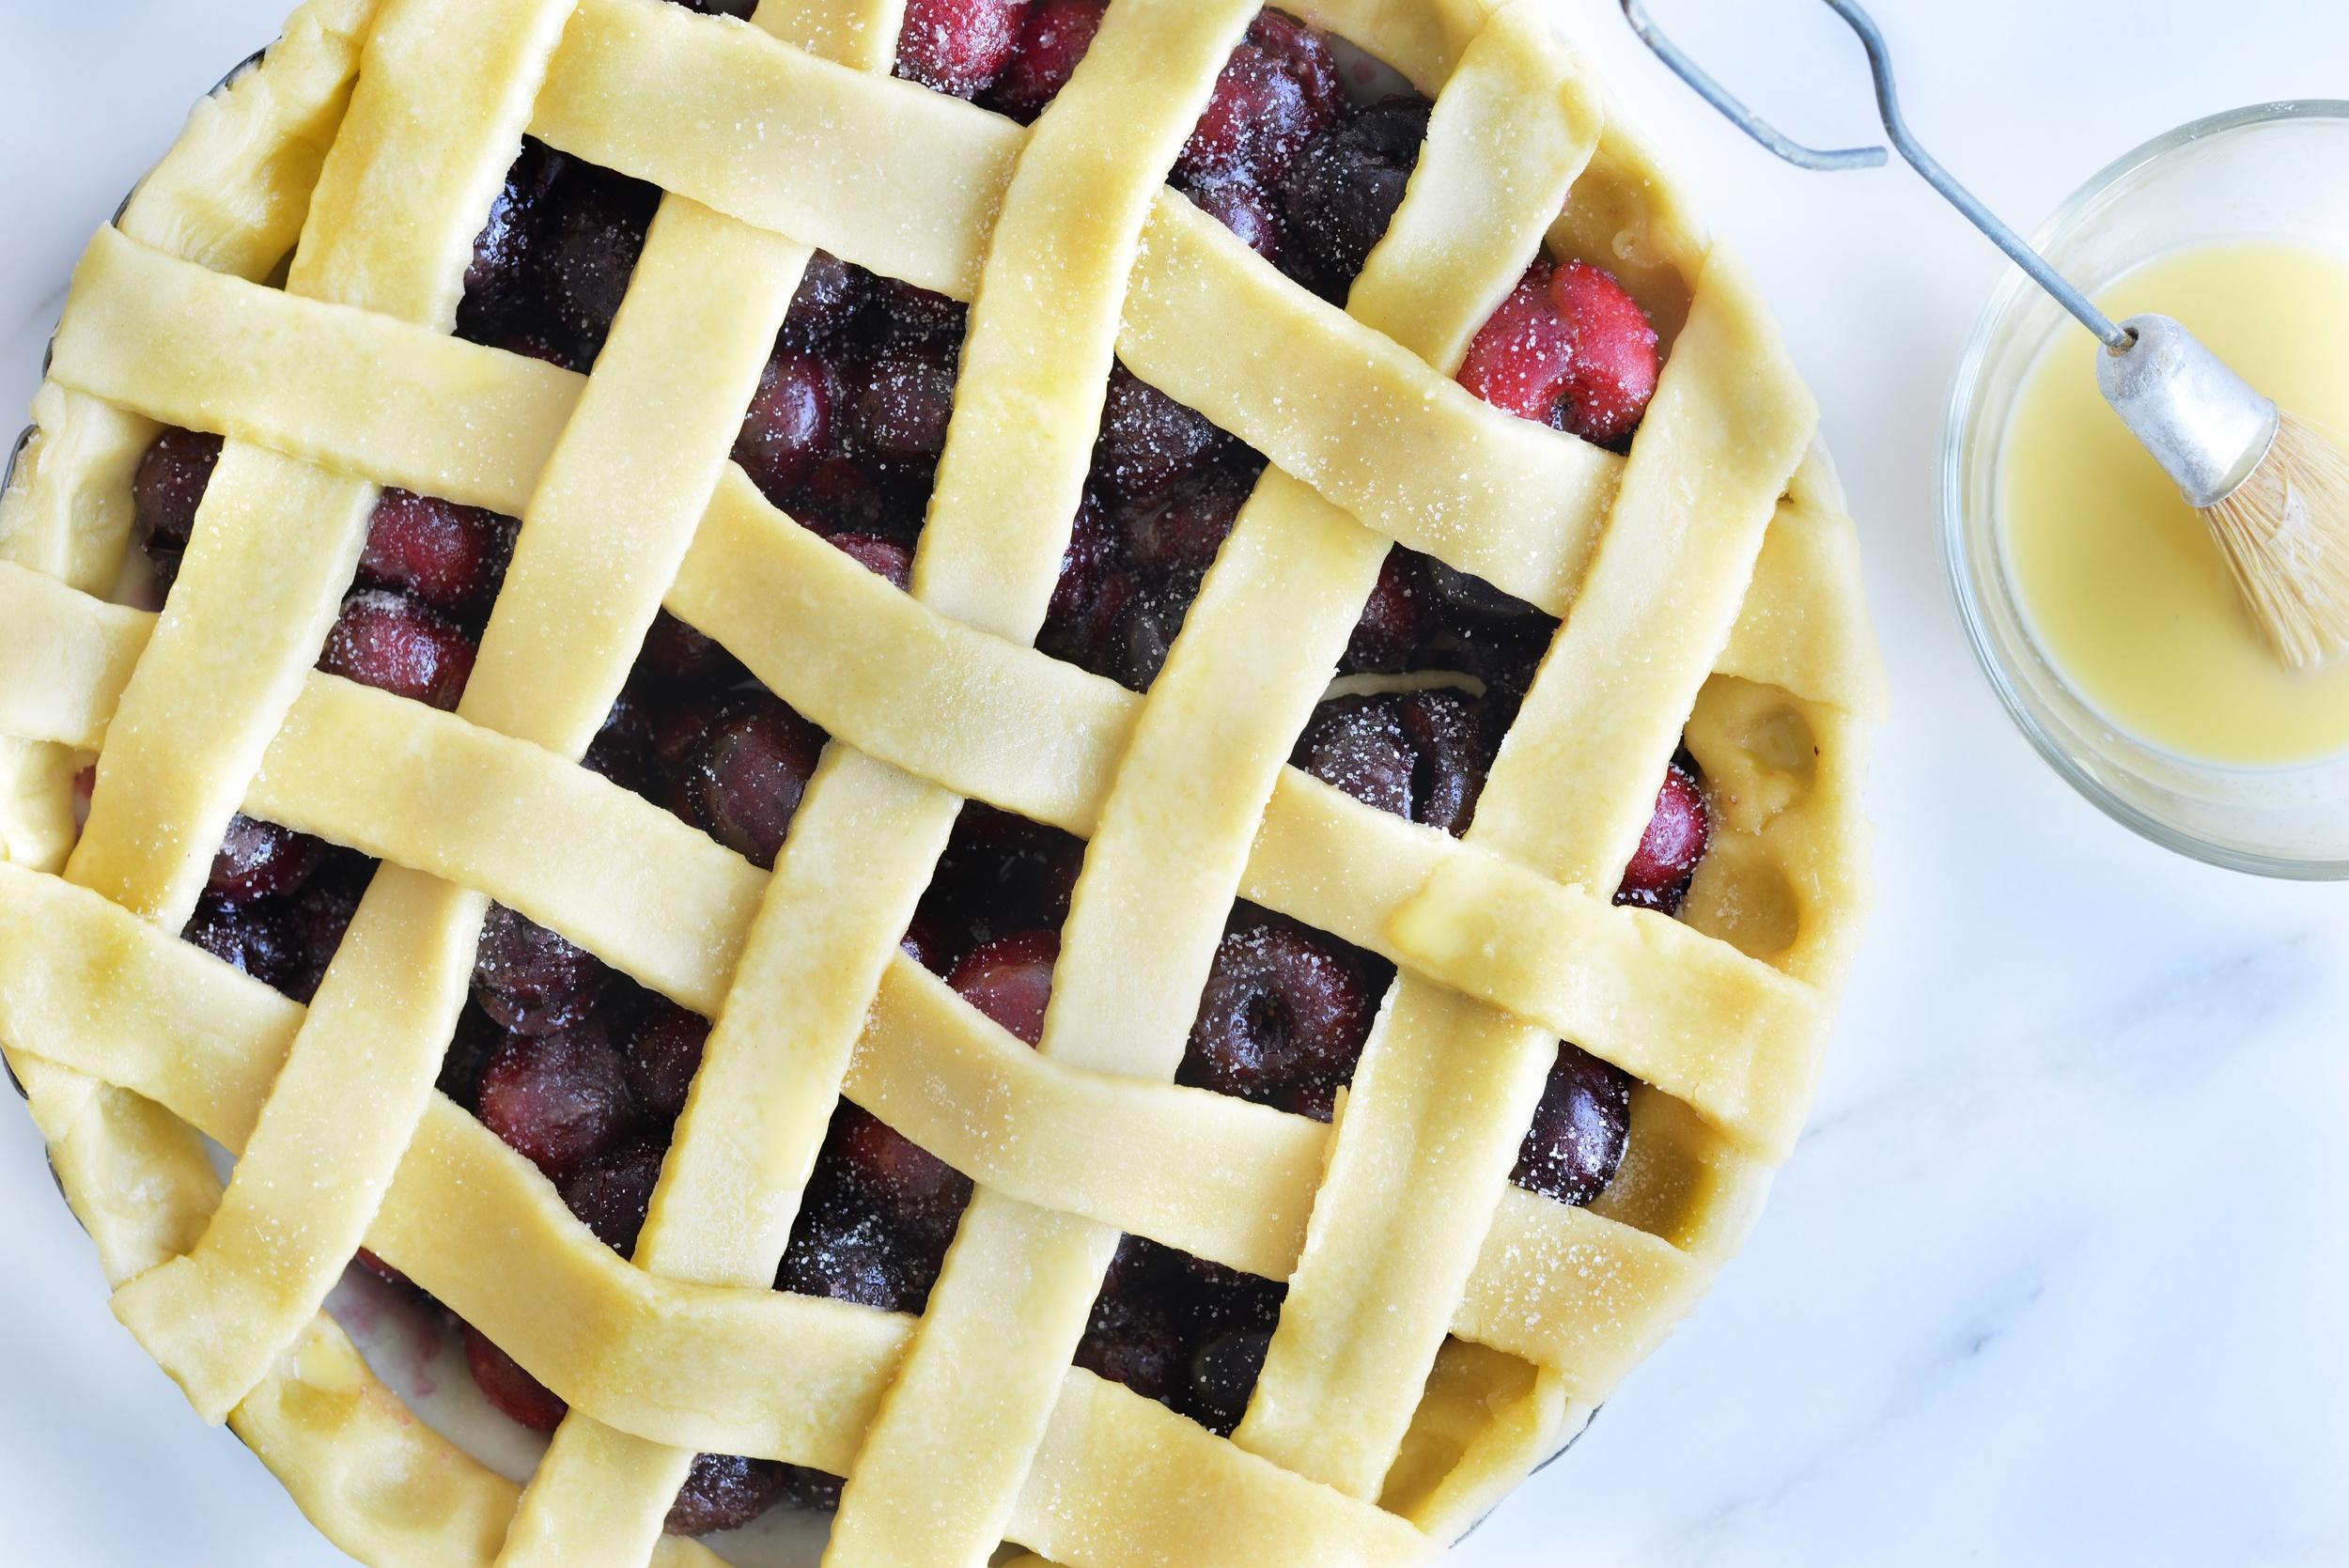 cropped pie.jpg